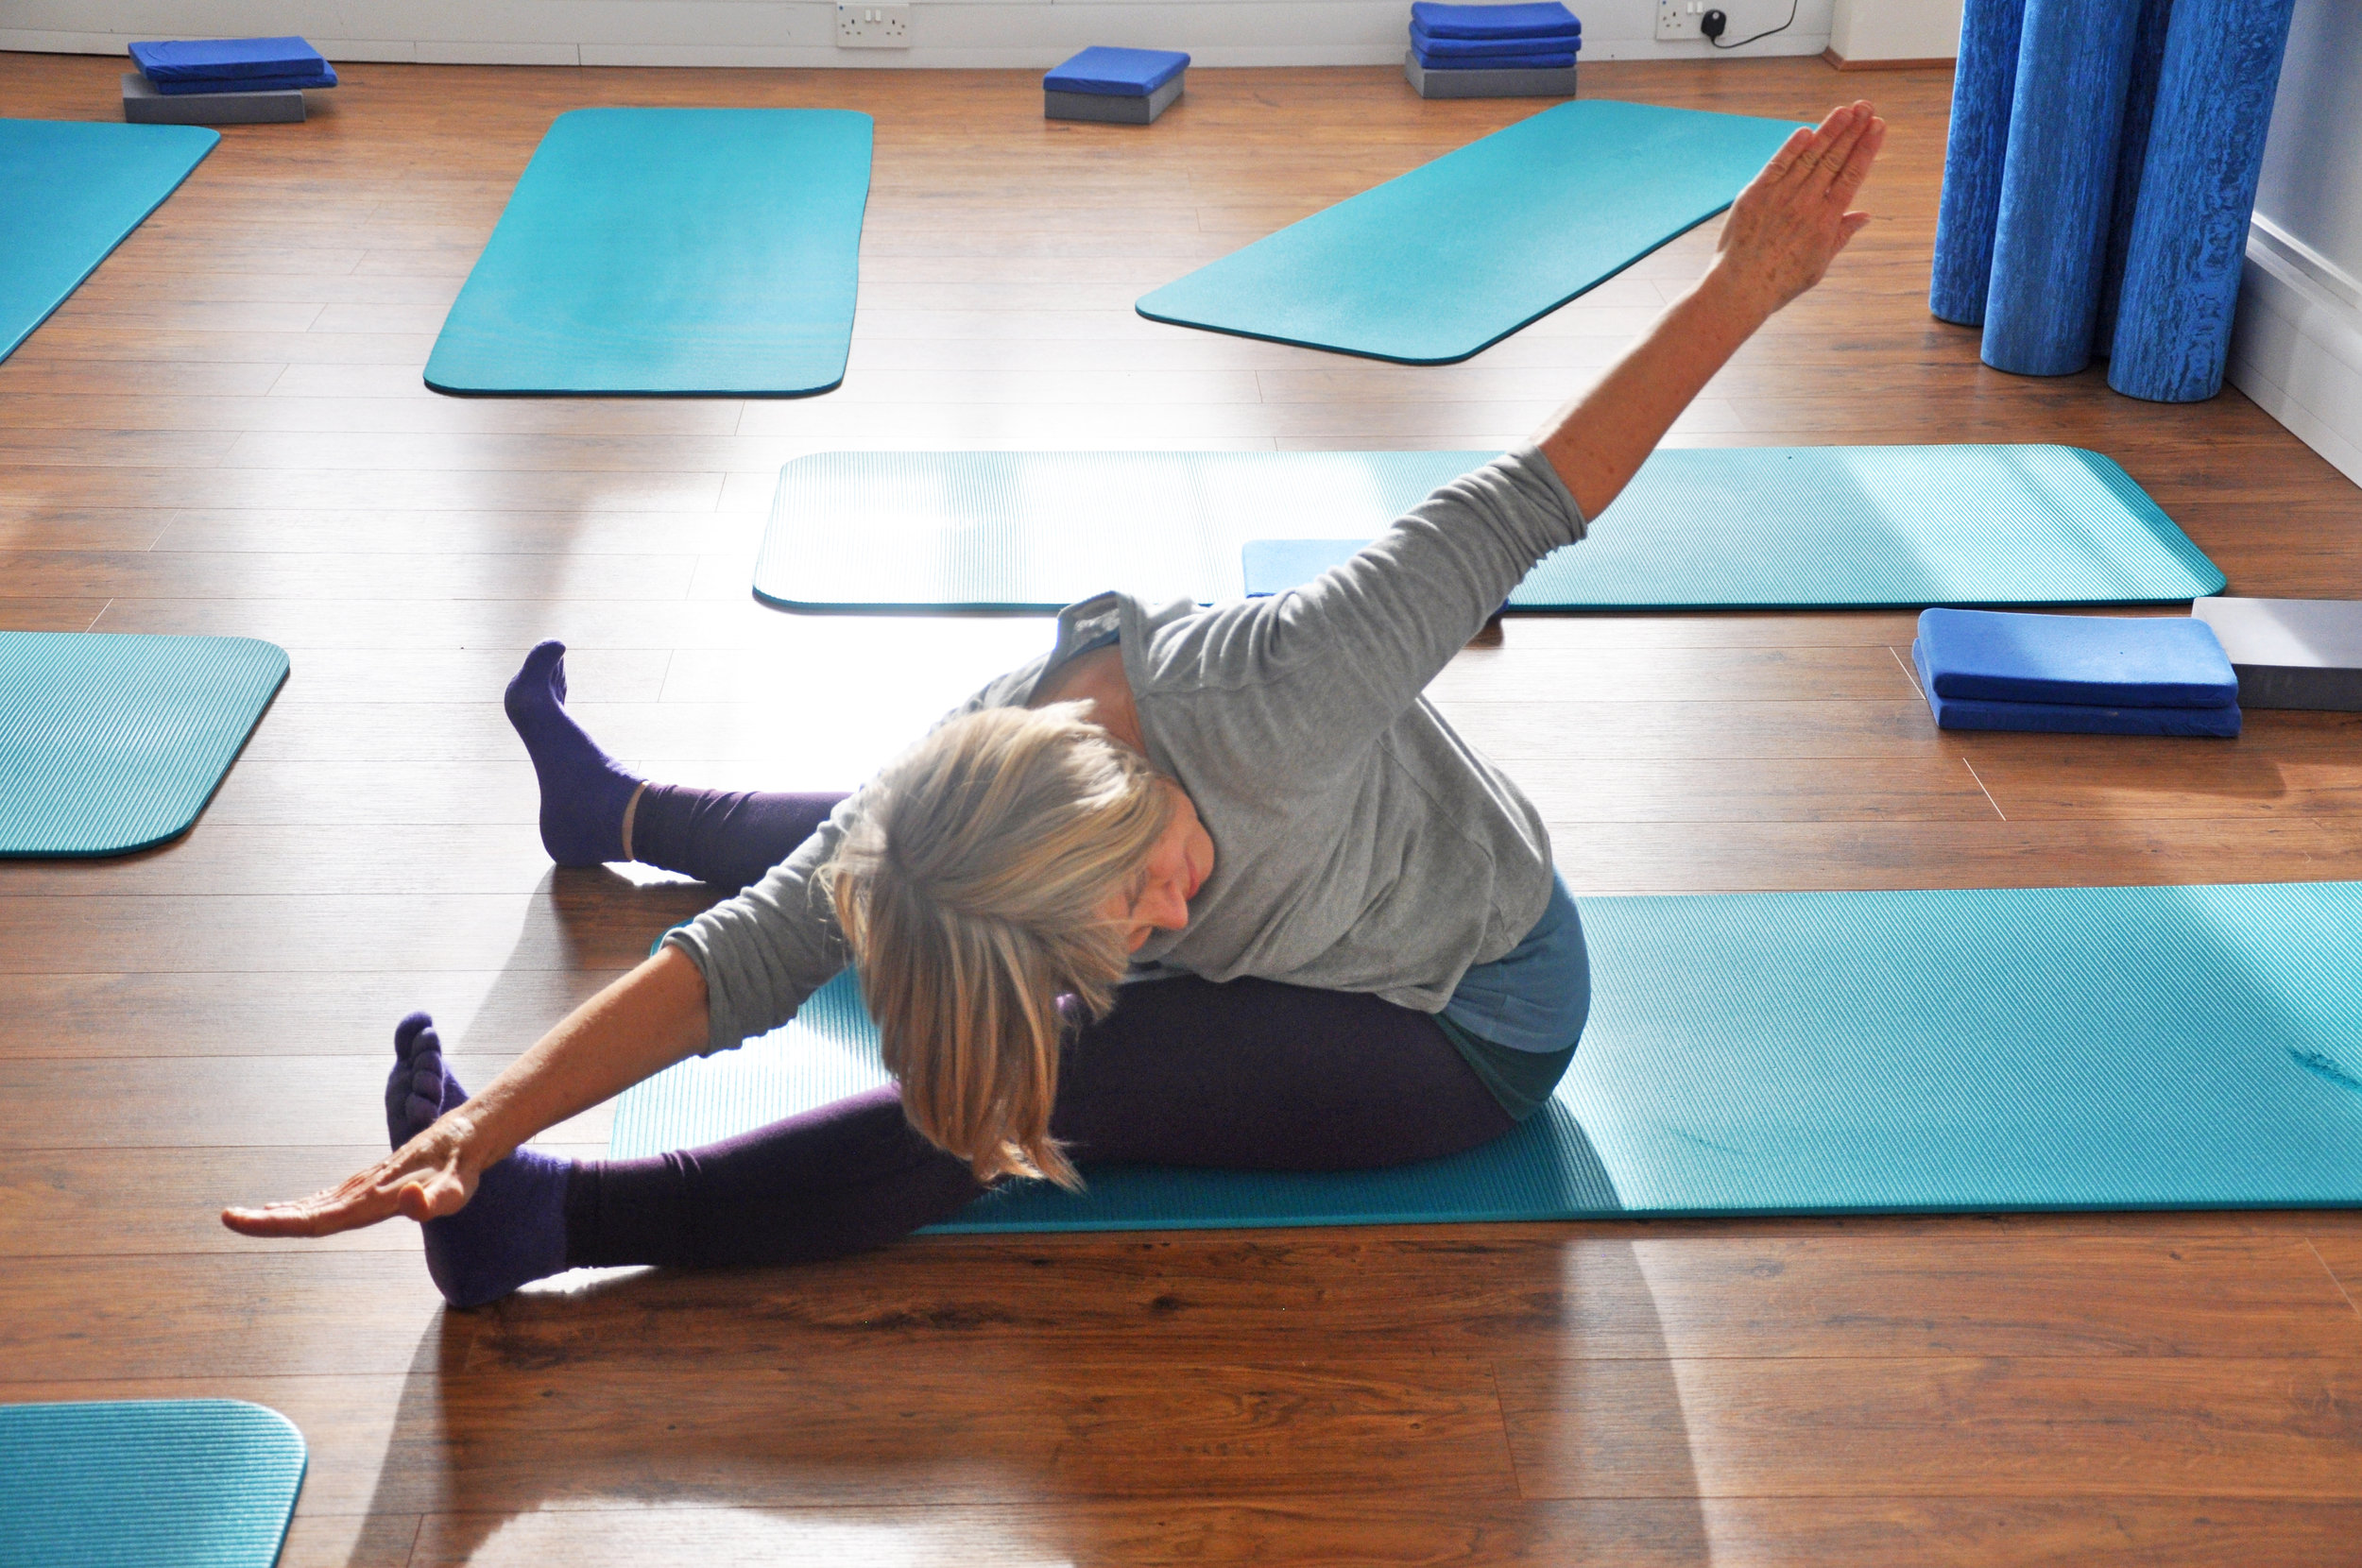 Pilates in Hertfordshire, Pilates in Essex, Pilates in Hertford, Pilates in Letchworth, Pilates in Ware, Pilates in Roydon